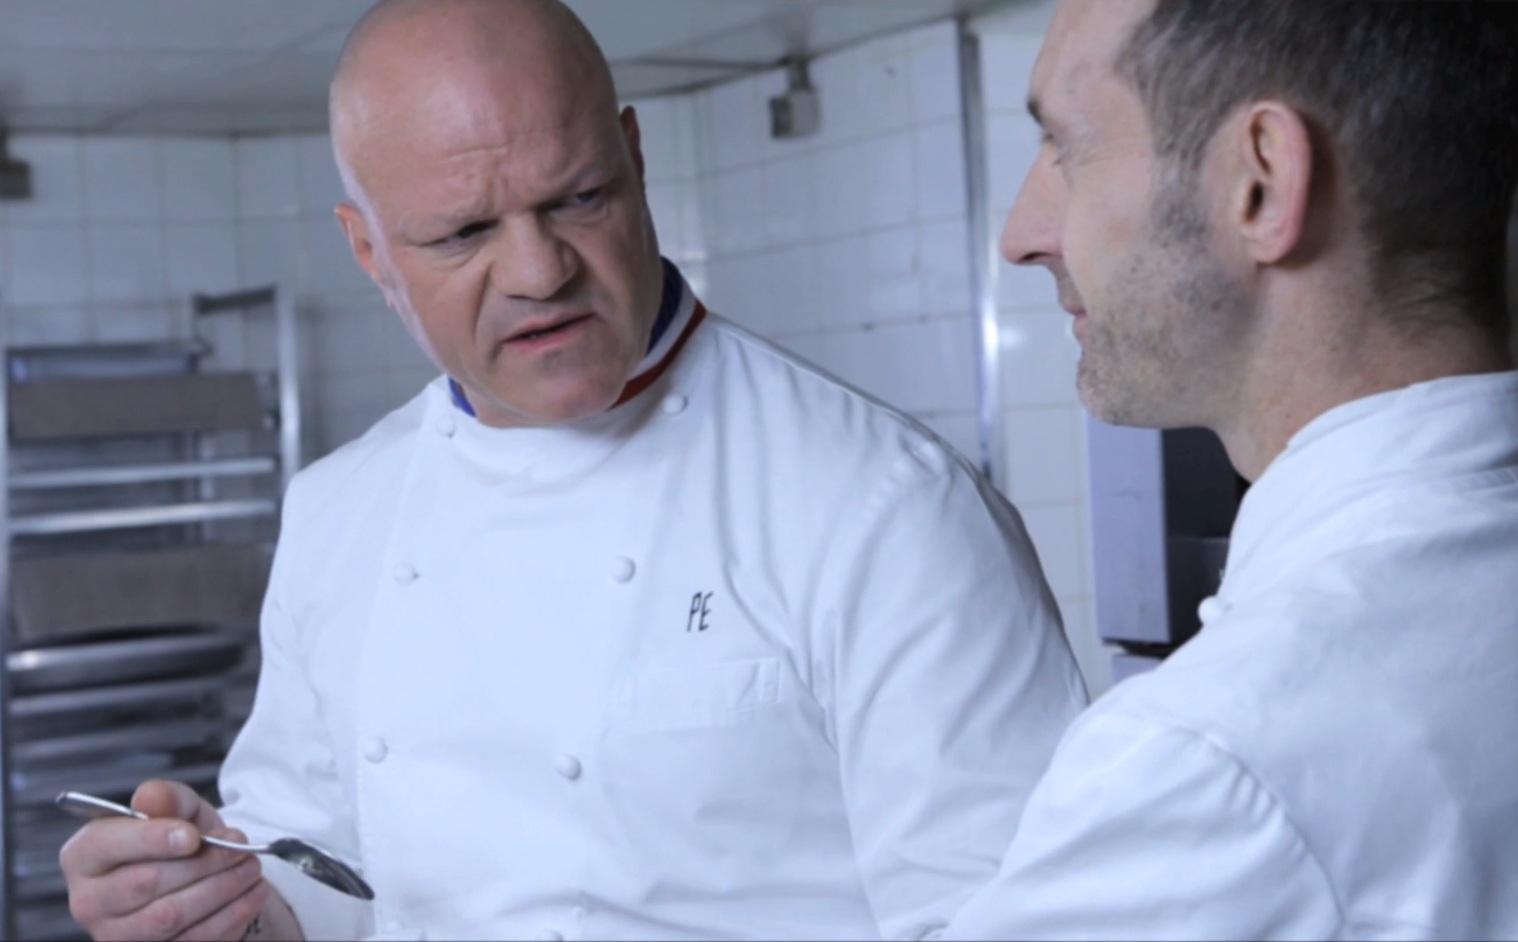 Norbert et le chef etchebest p tent un plomb en cuisine for Livre cuisine norbert